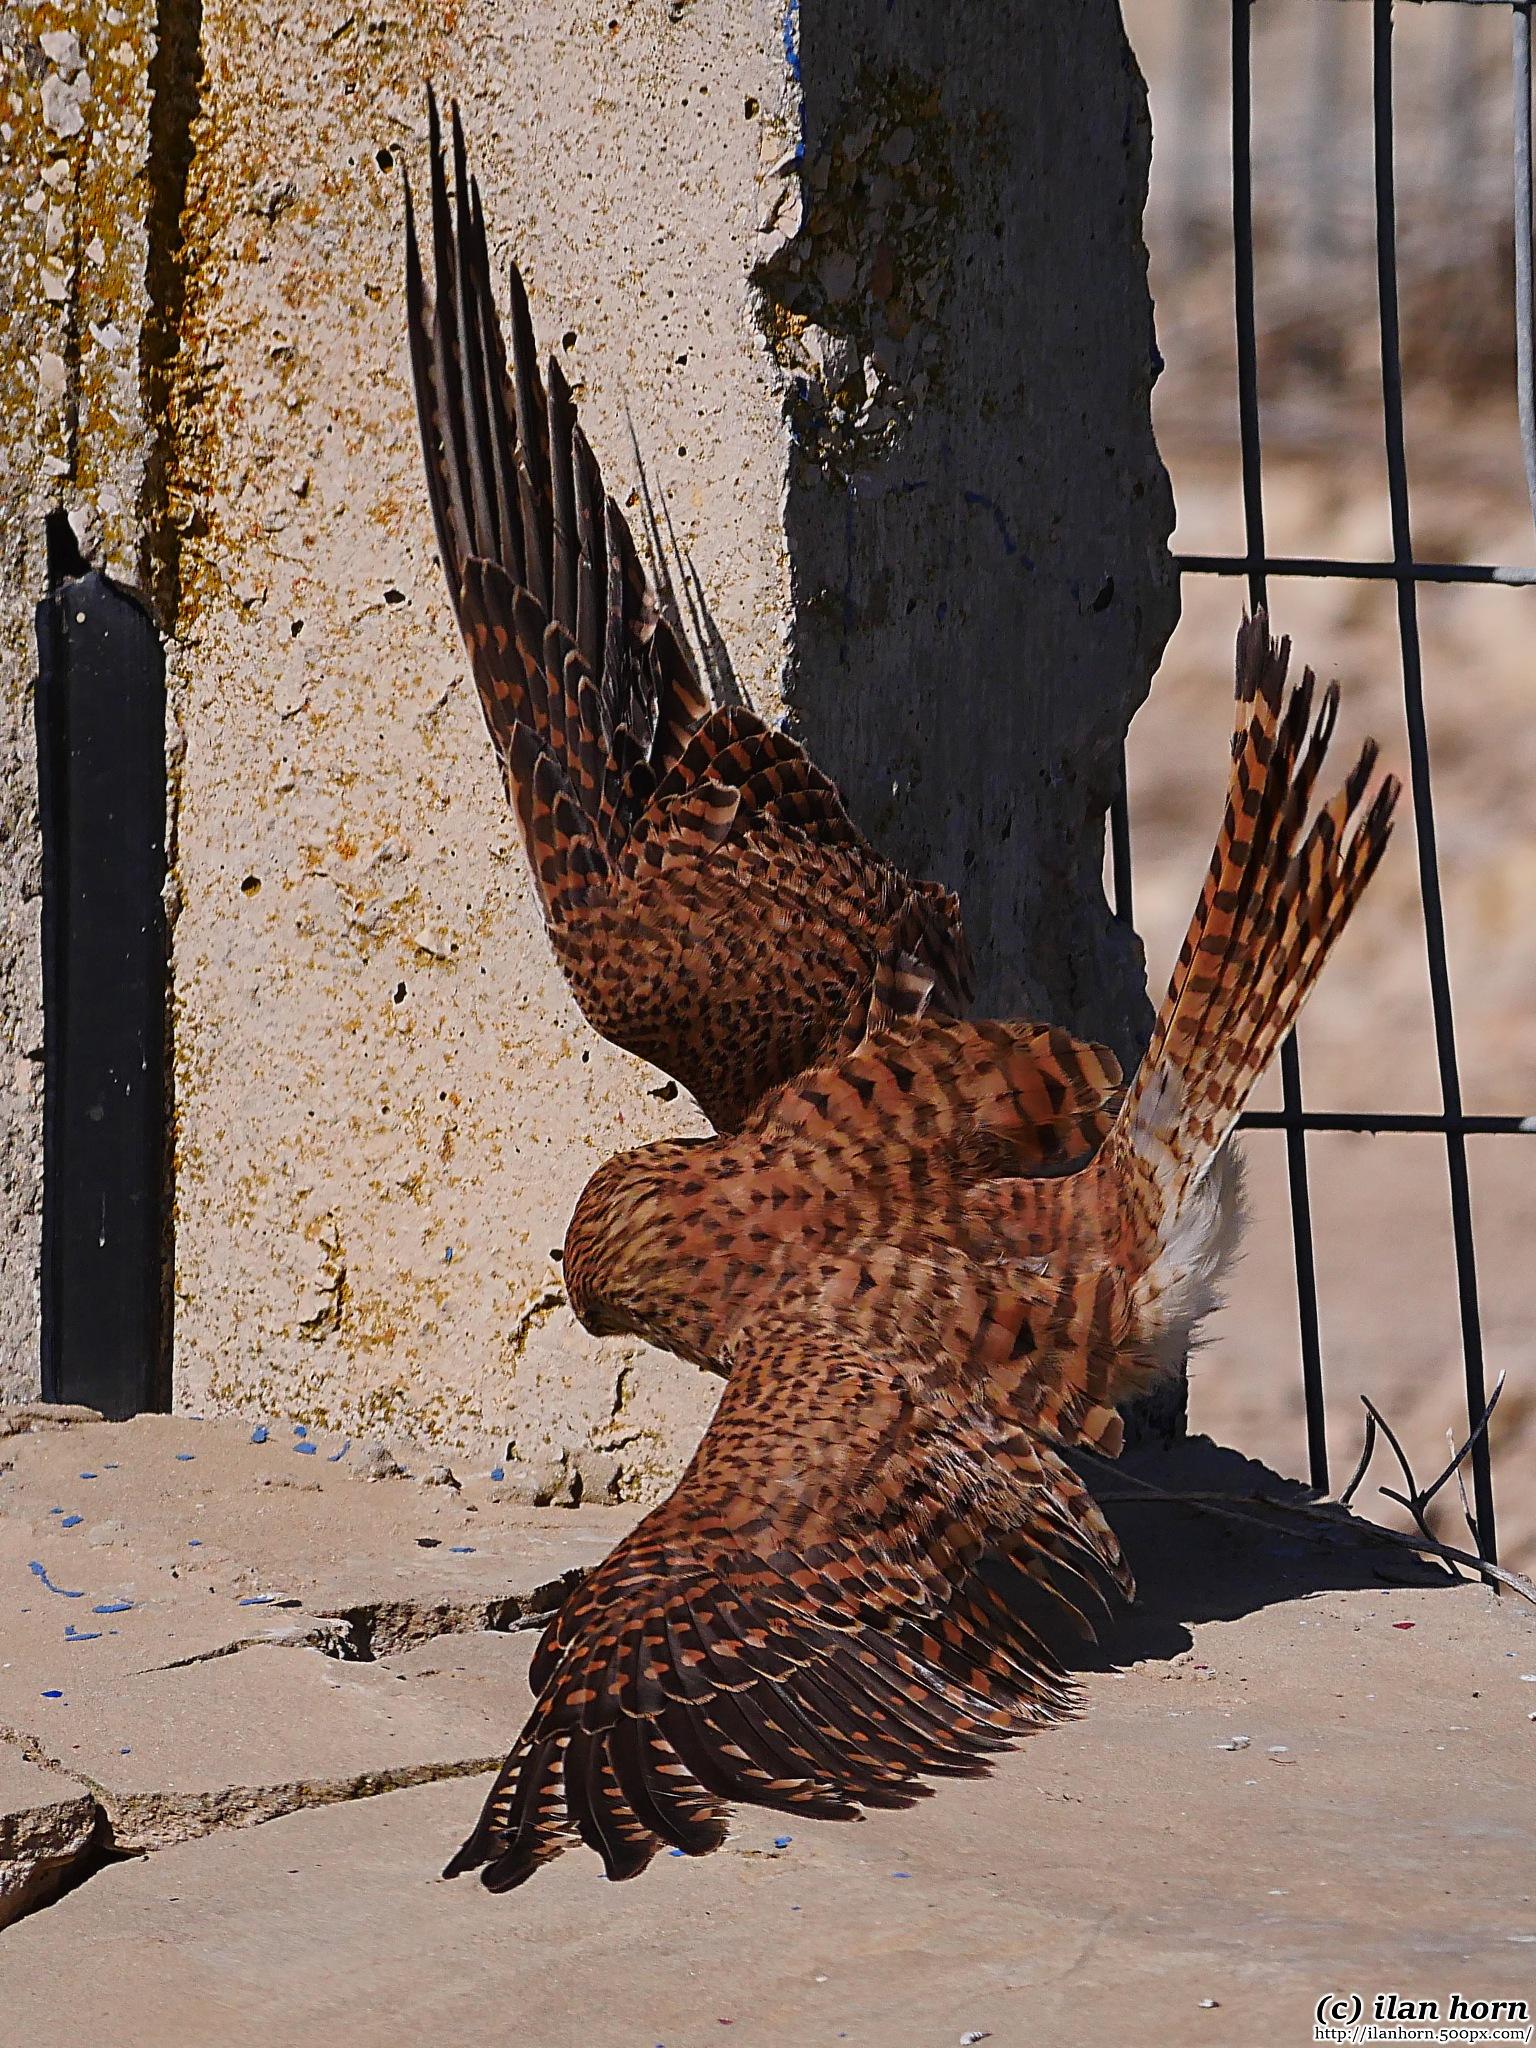 Kestrel trying to catch something by ilanhorn